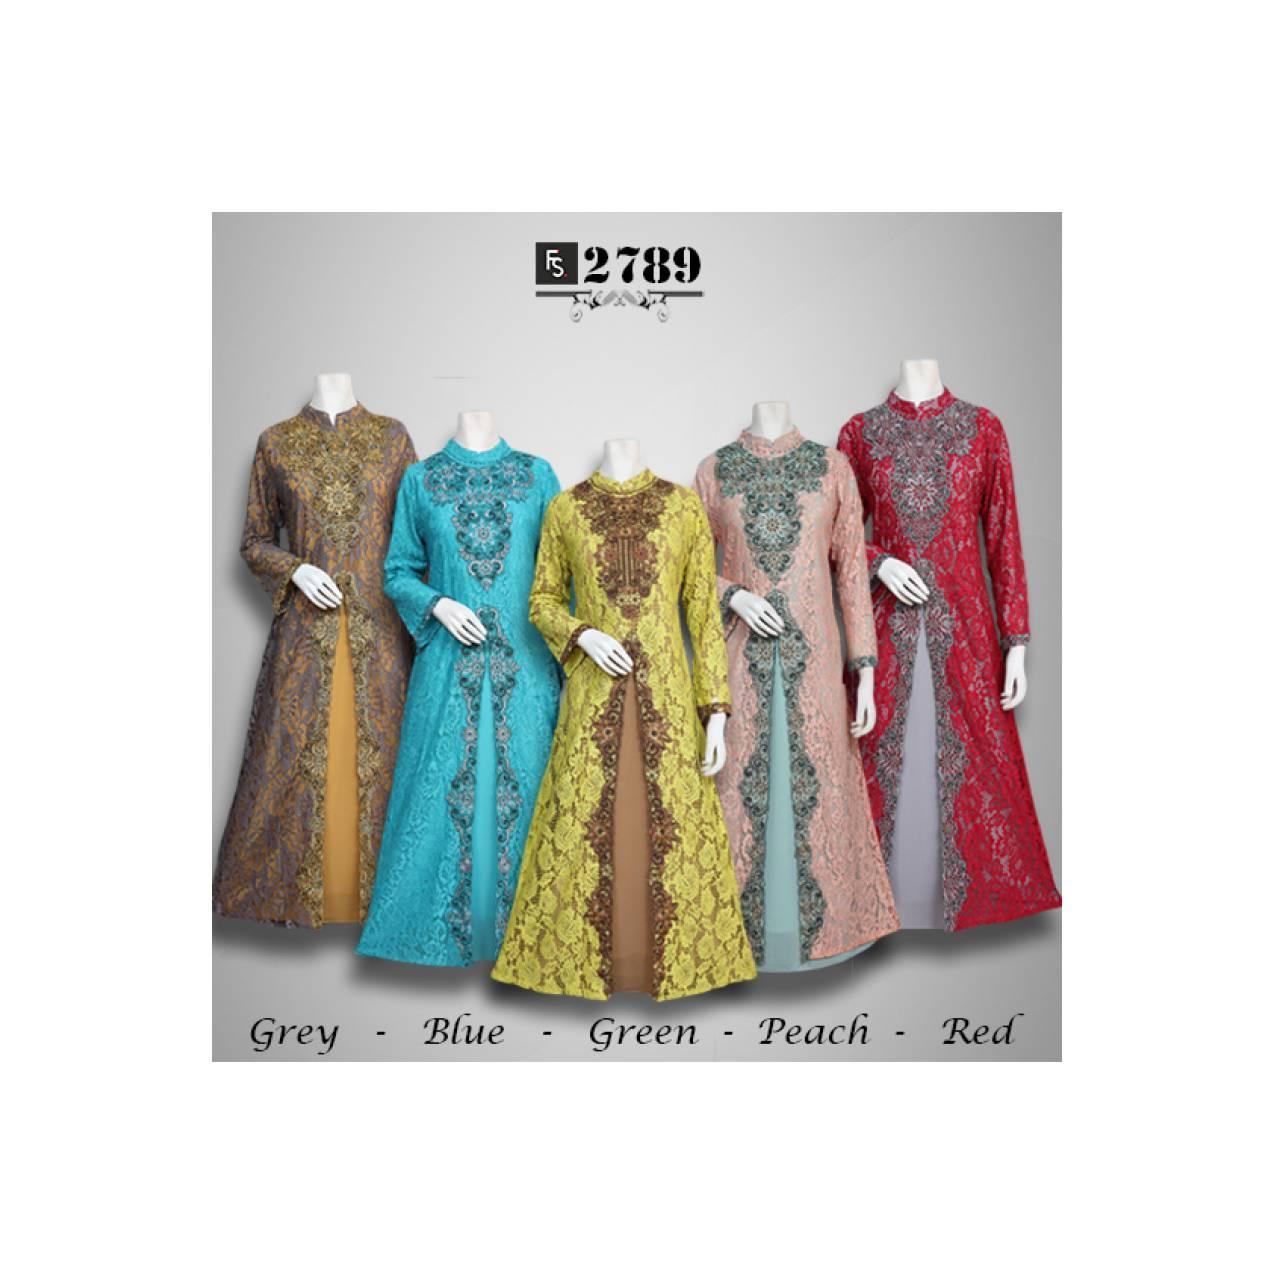 8a3a8439d9a695374bfbf838aa9f2ebd Review Harga Gamis Dari Brokat Elegant Paling Baru 2018